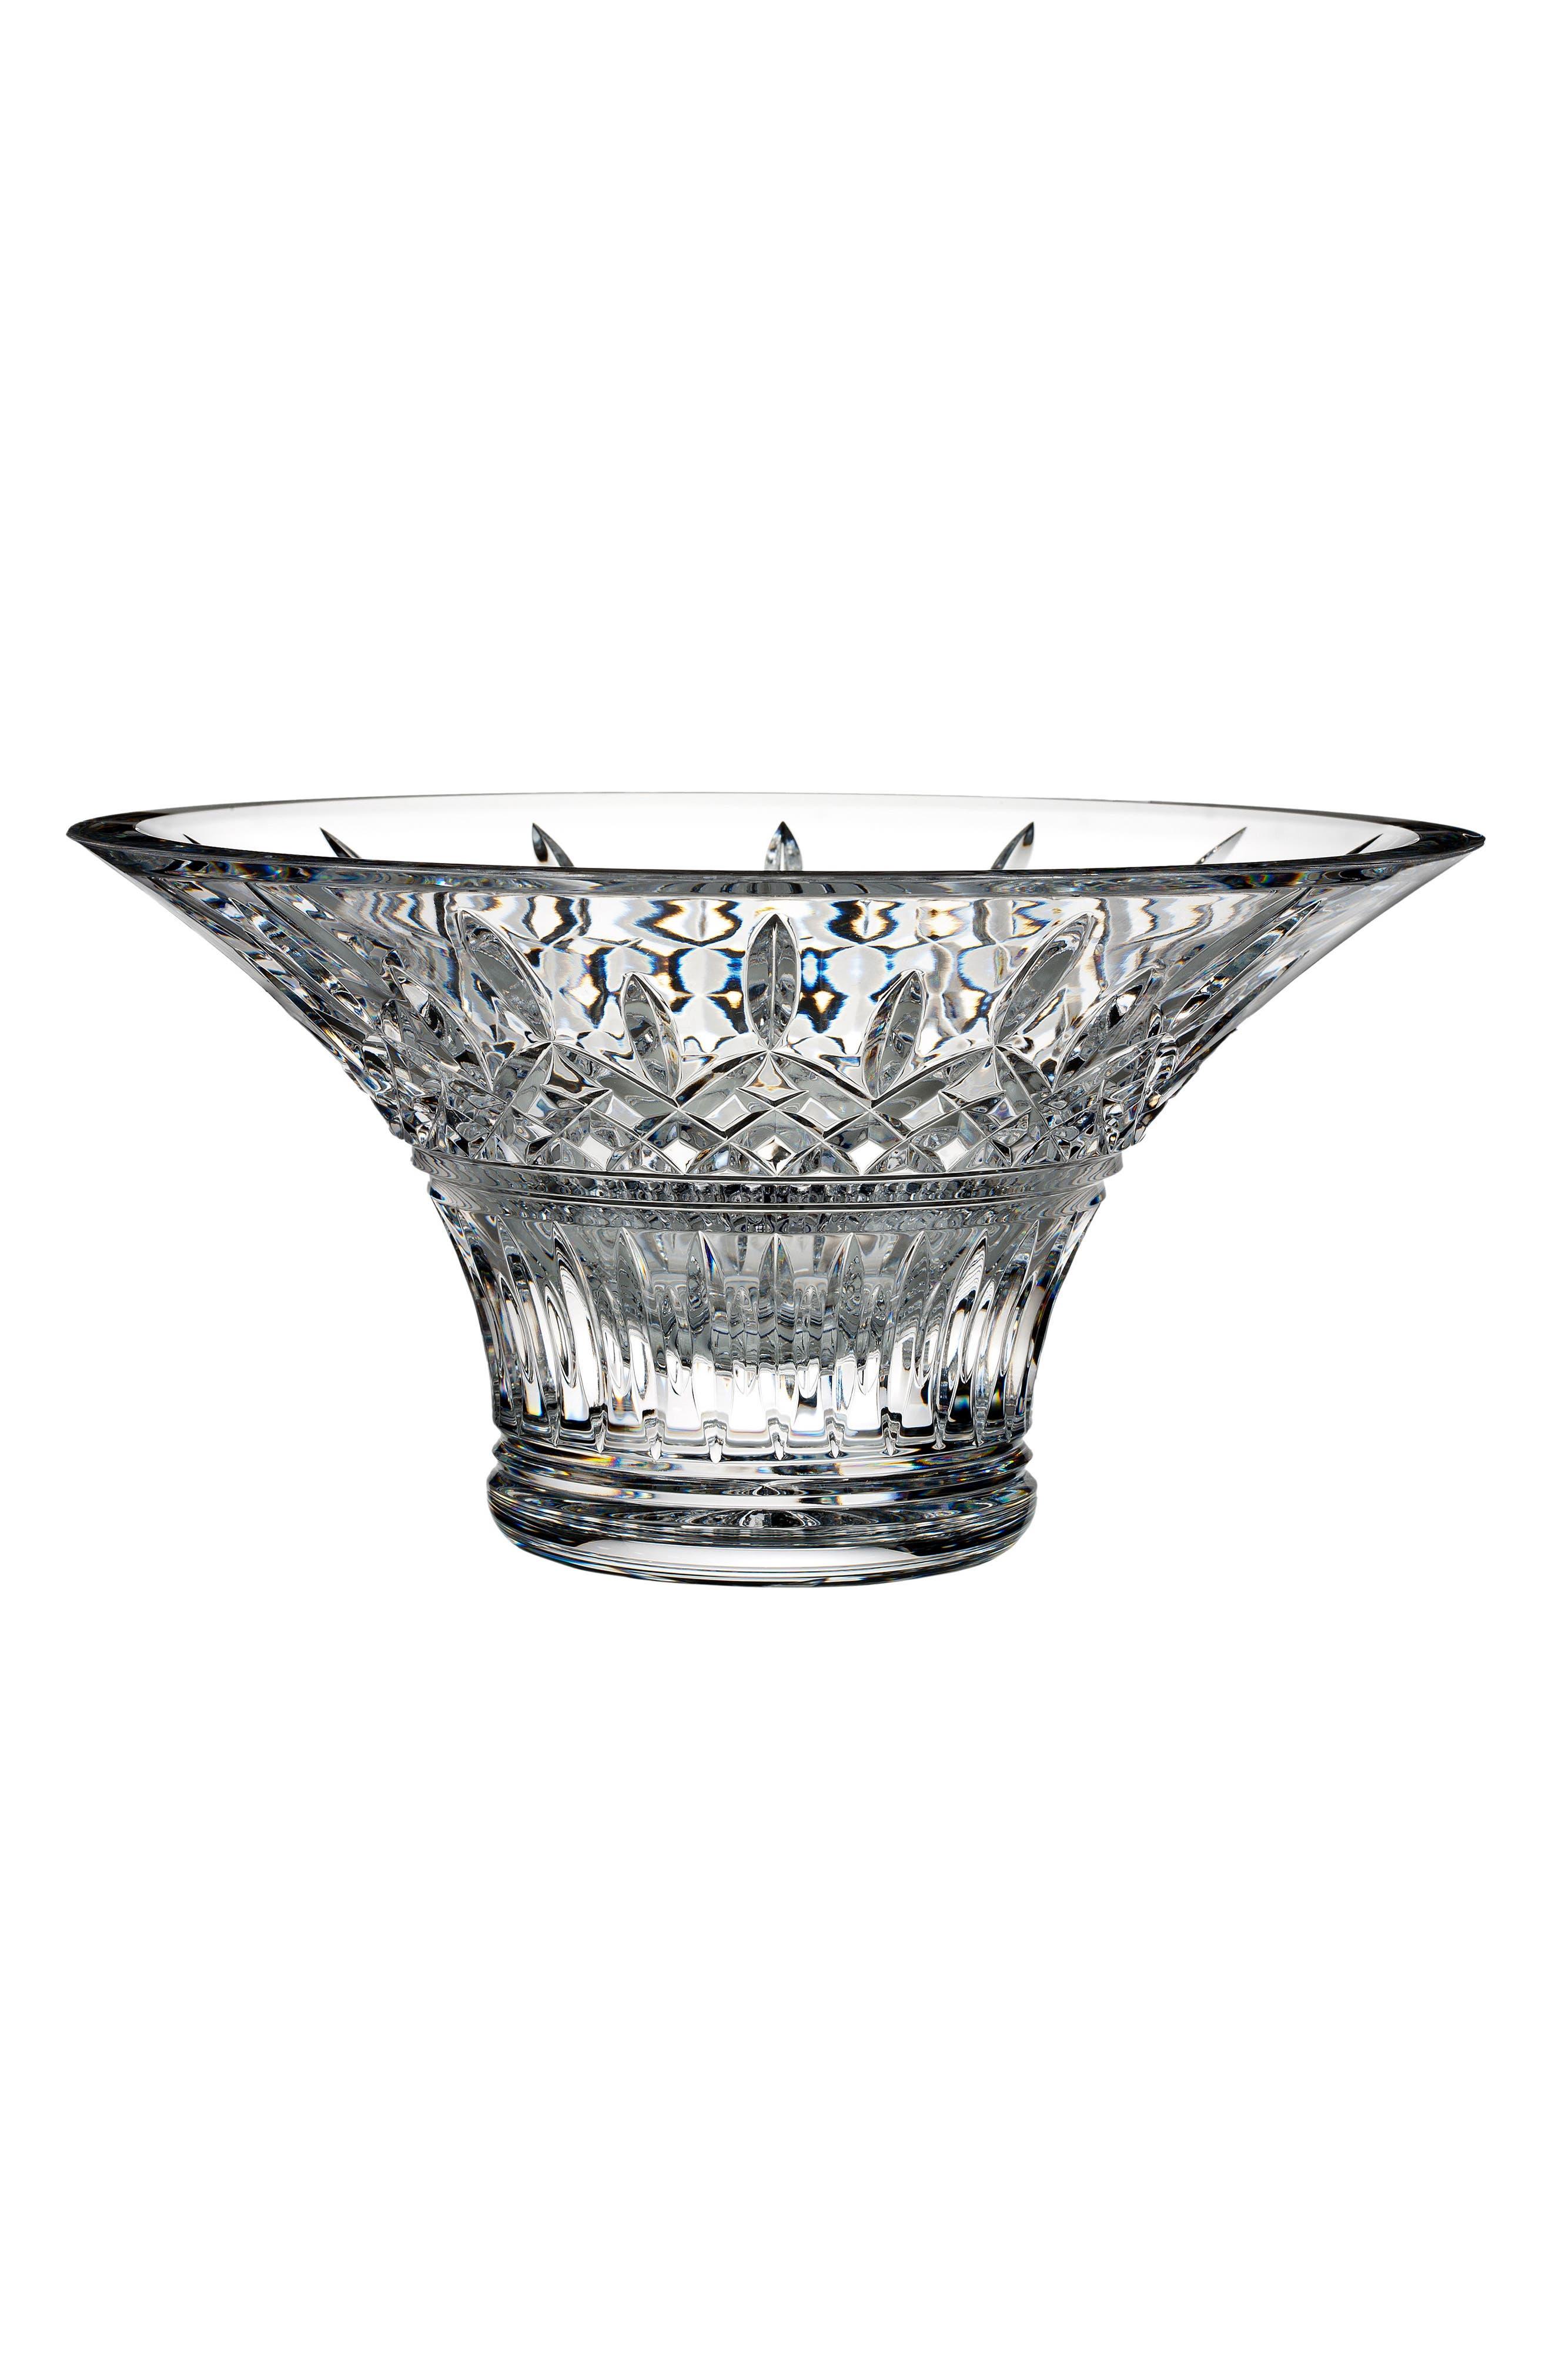 Alternate Image 1 Selected - Waterford Lismore Lead Crystal Bowl